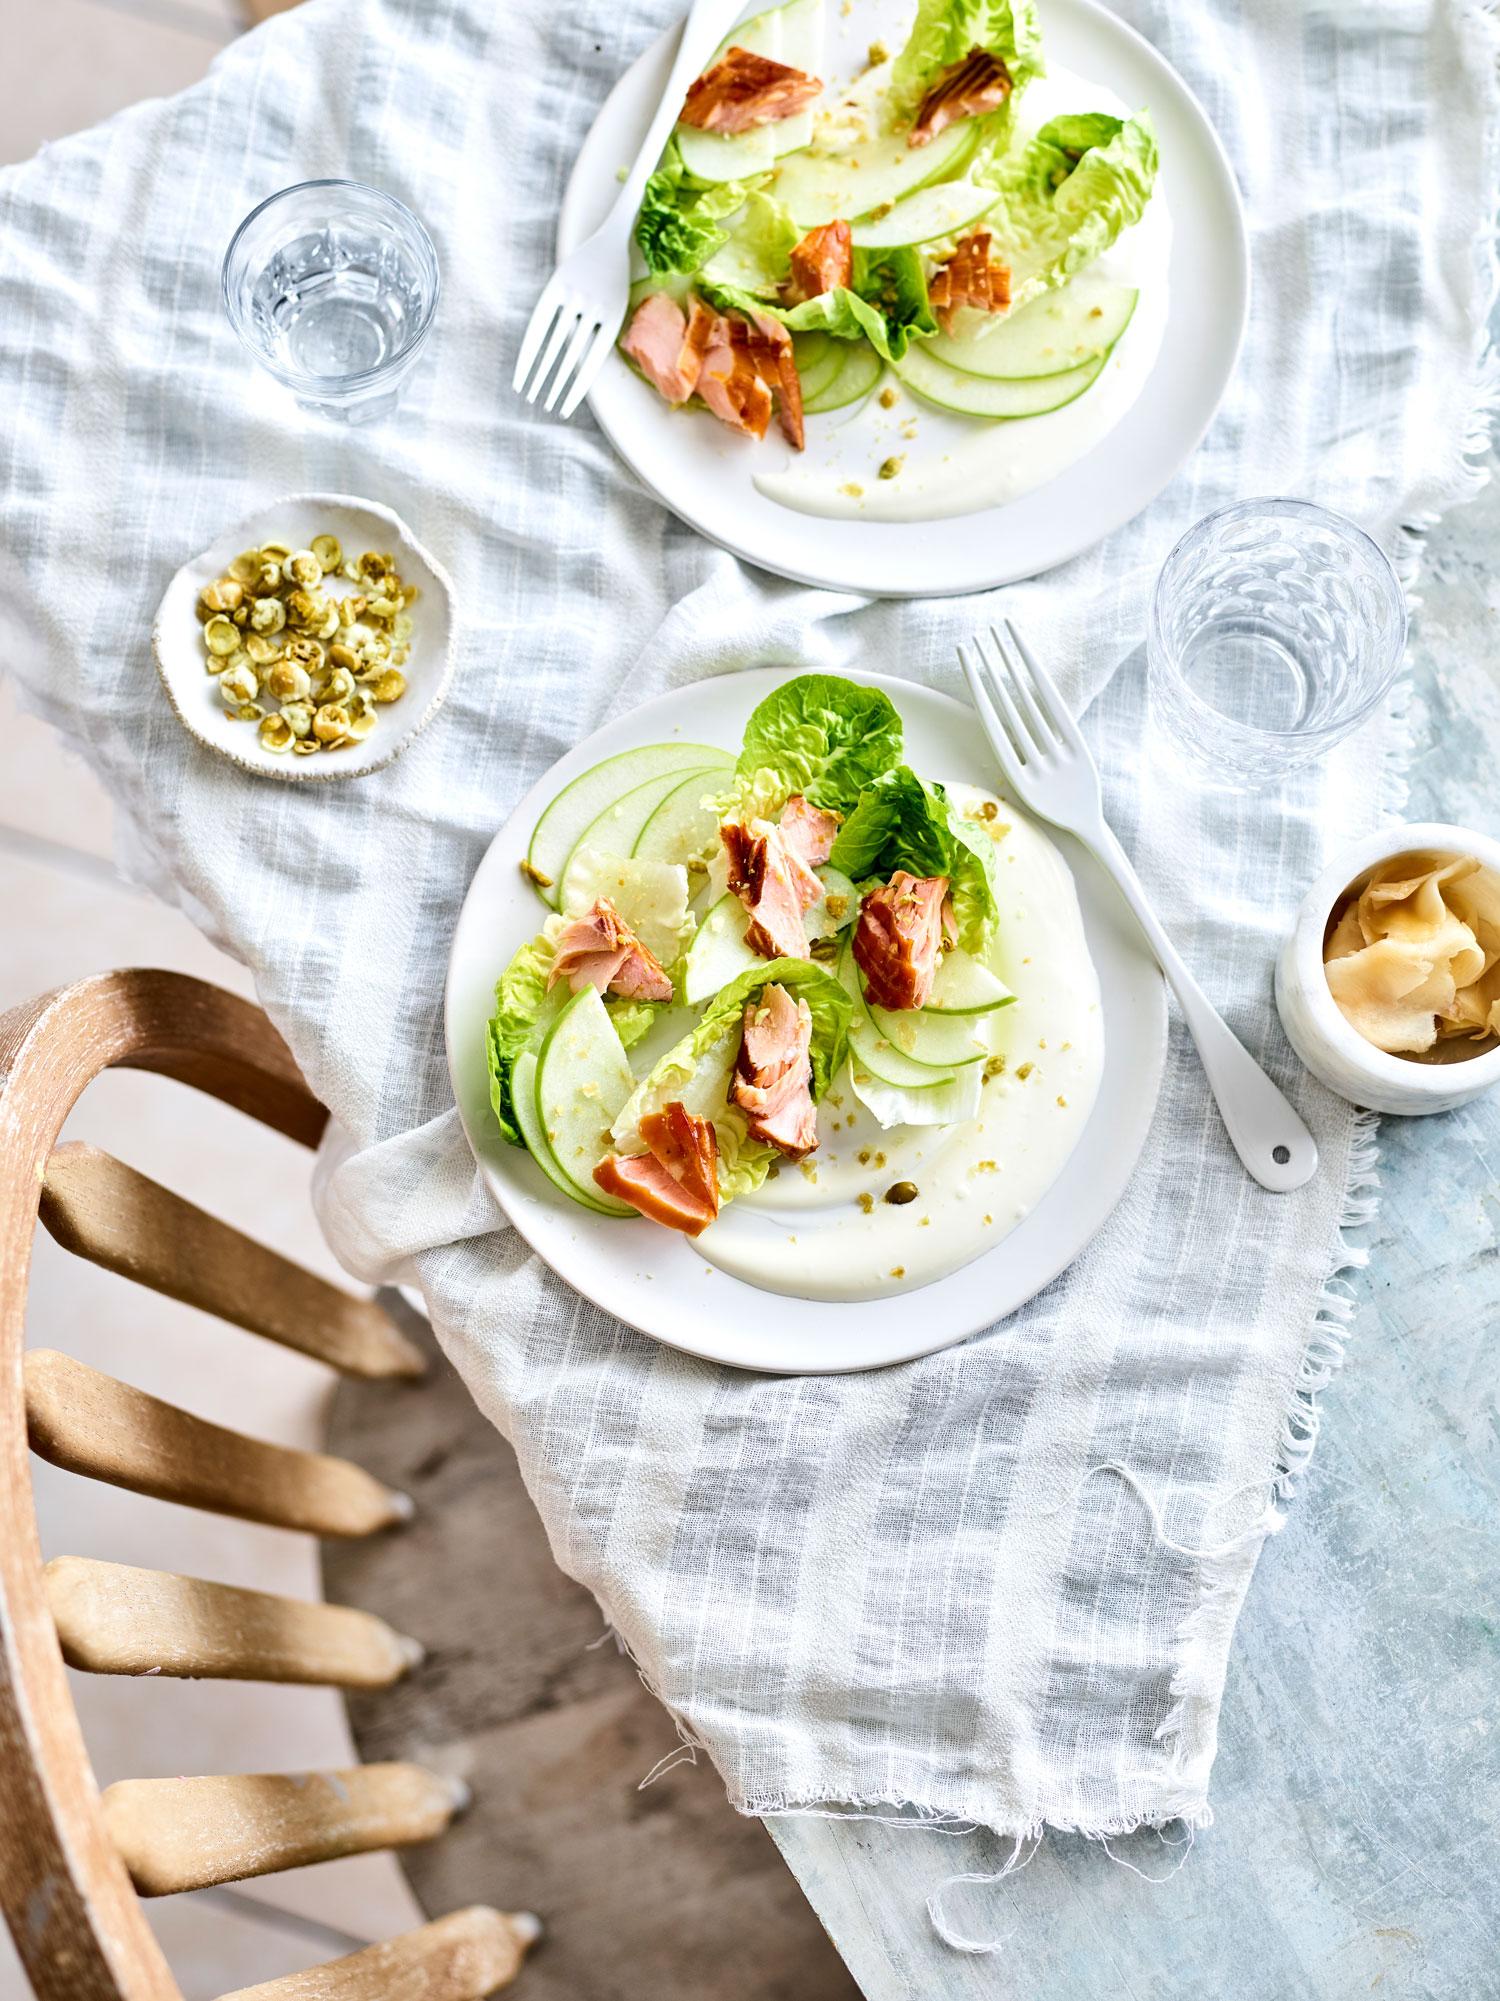 Hot-smoked-salmon-and-wasabi-peas copy